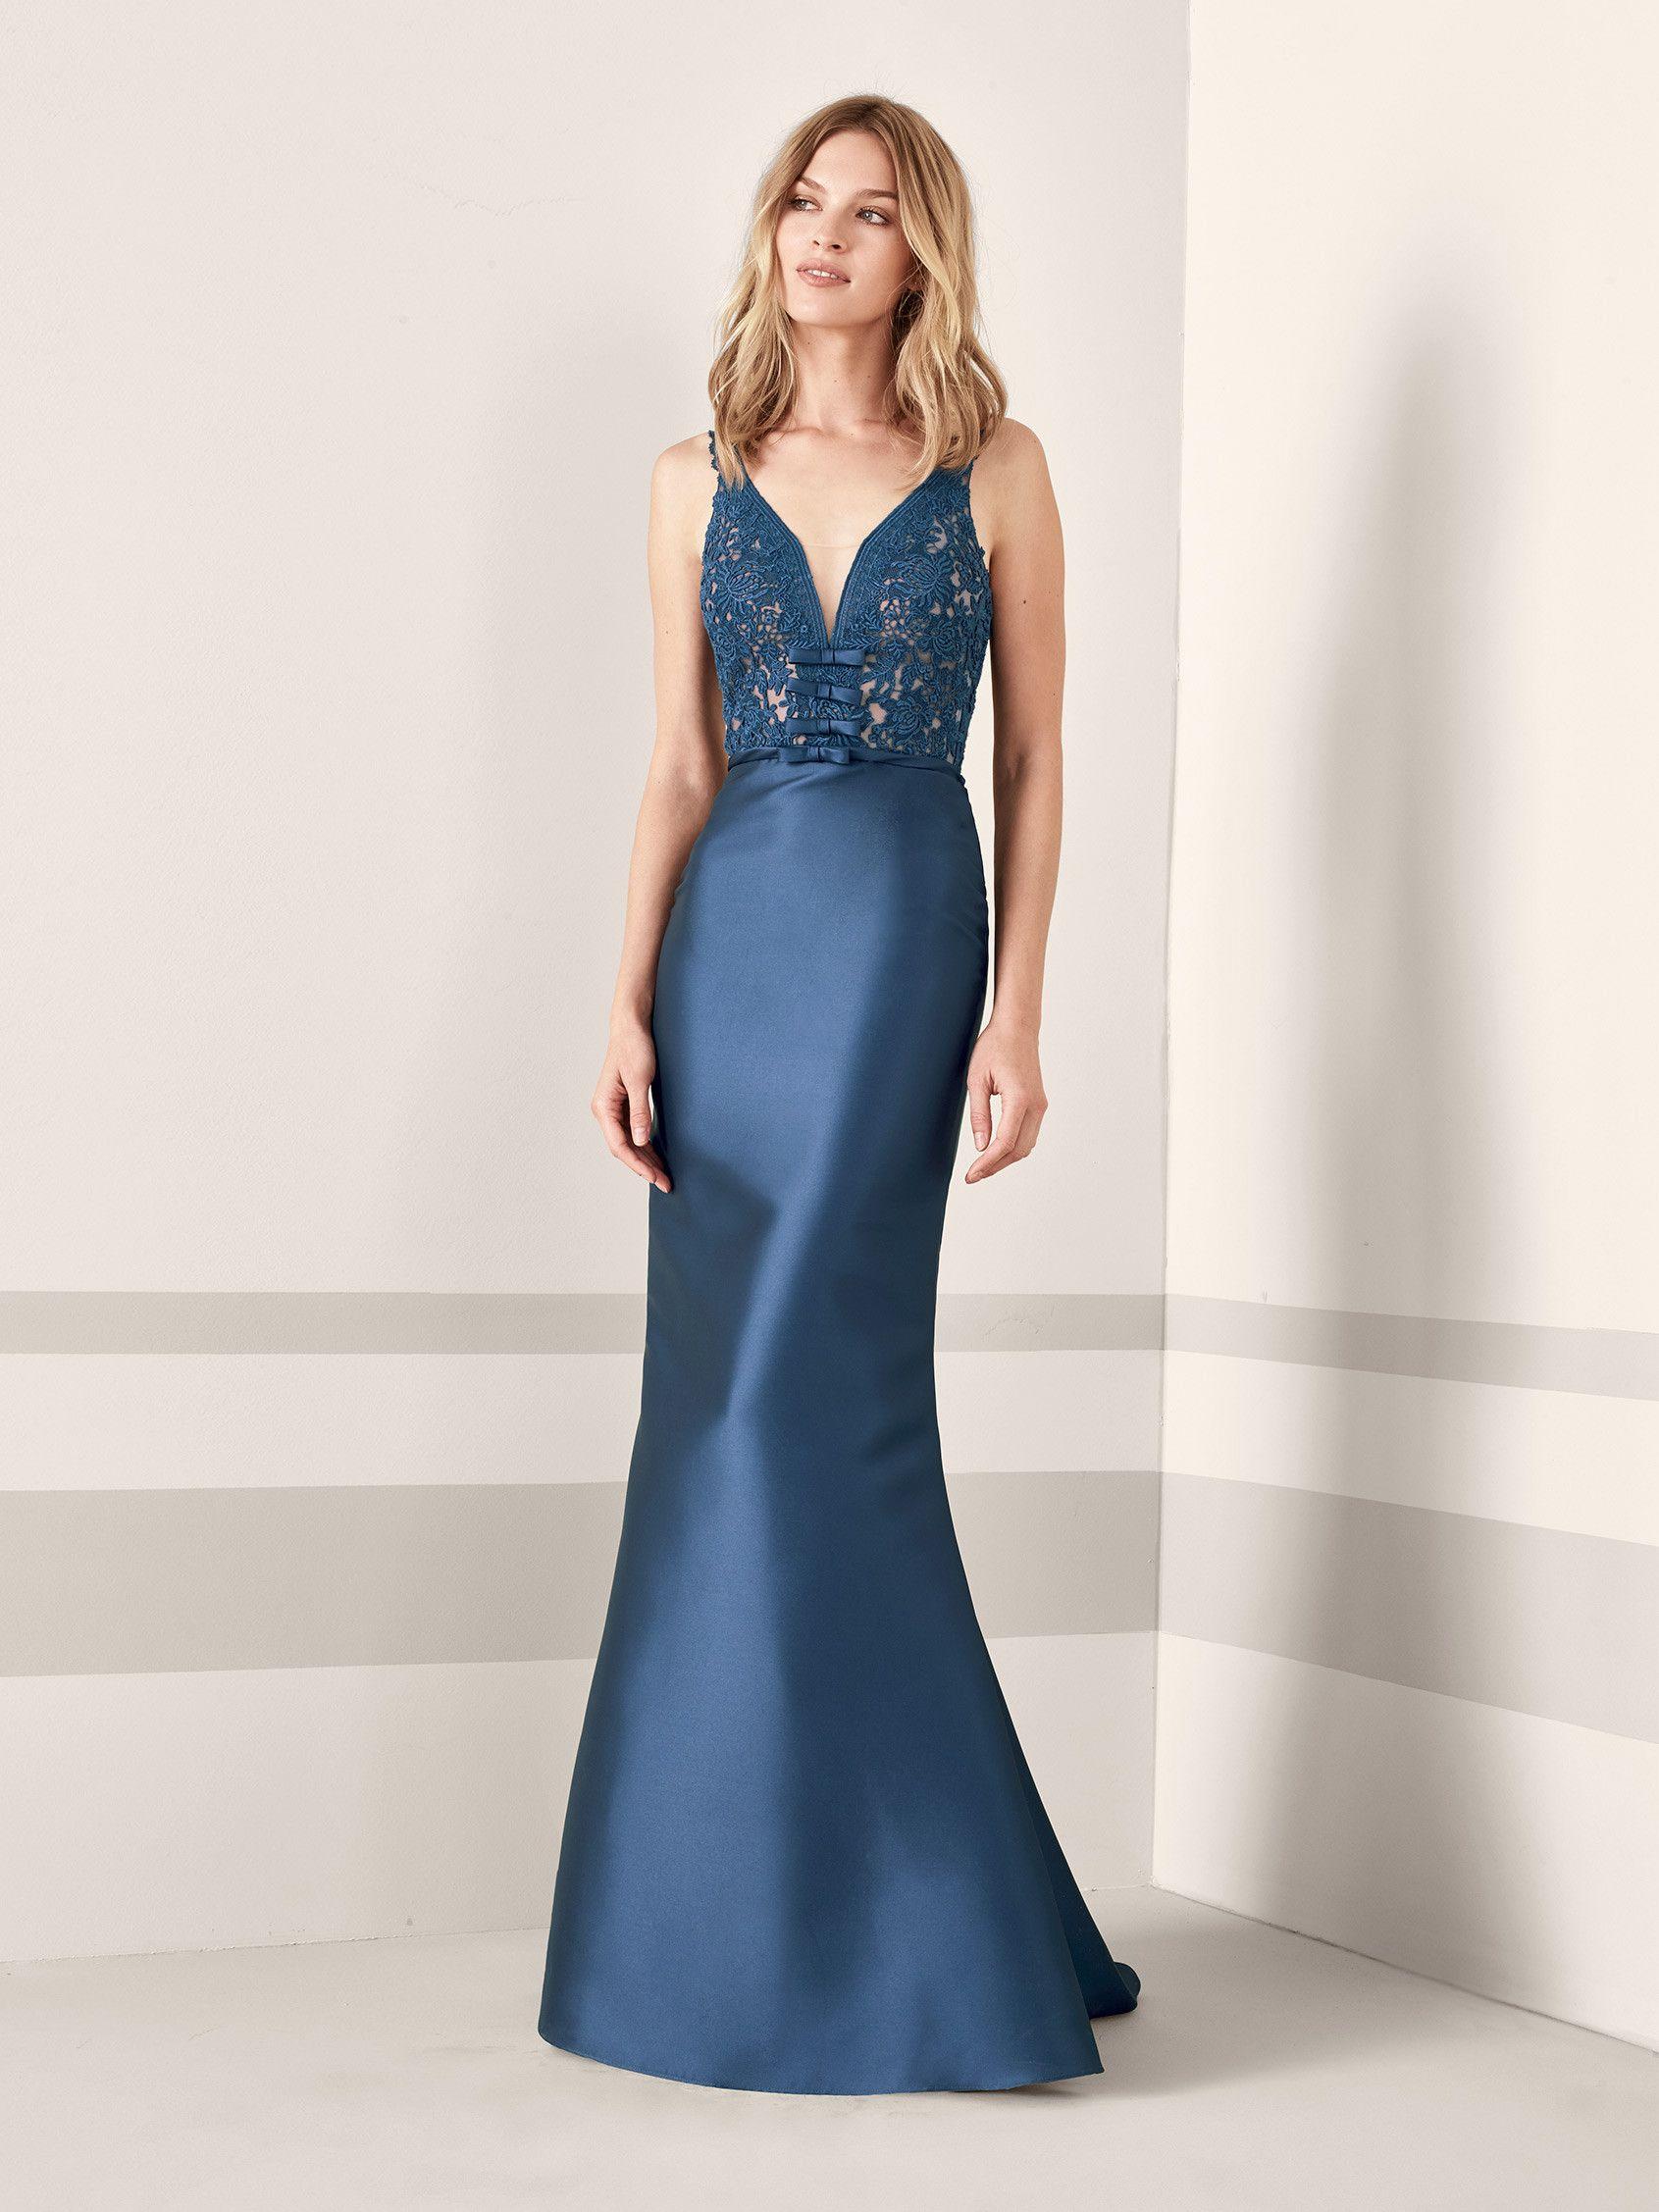 Vestidos fiesta pronovias 2019 precio